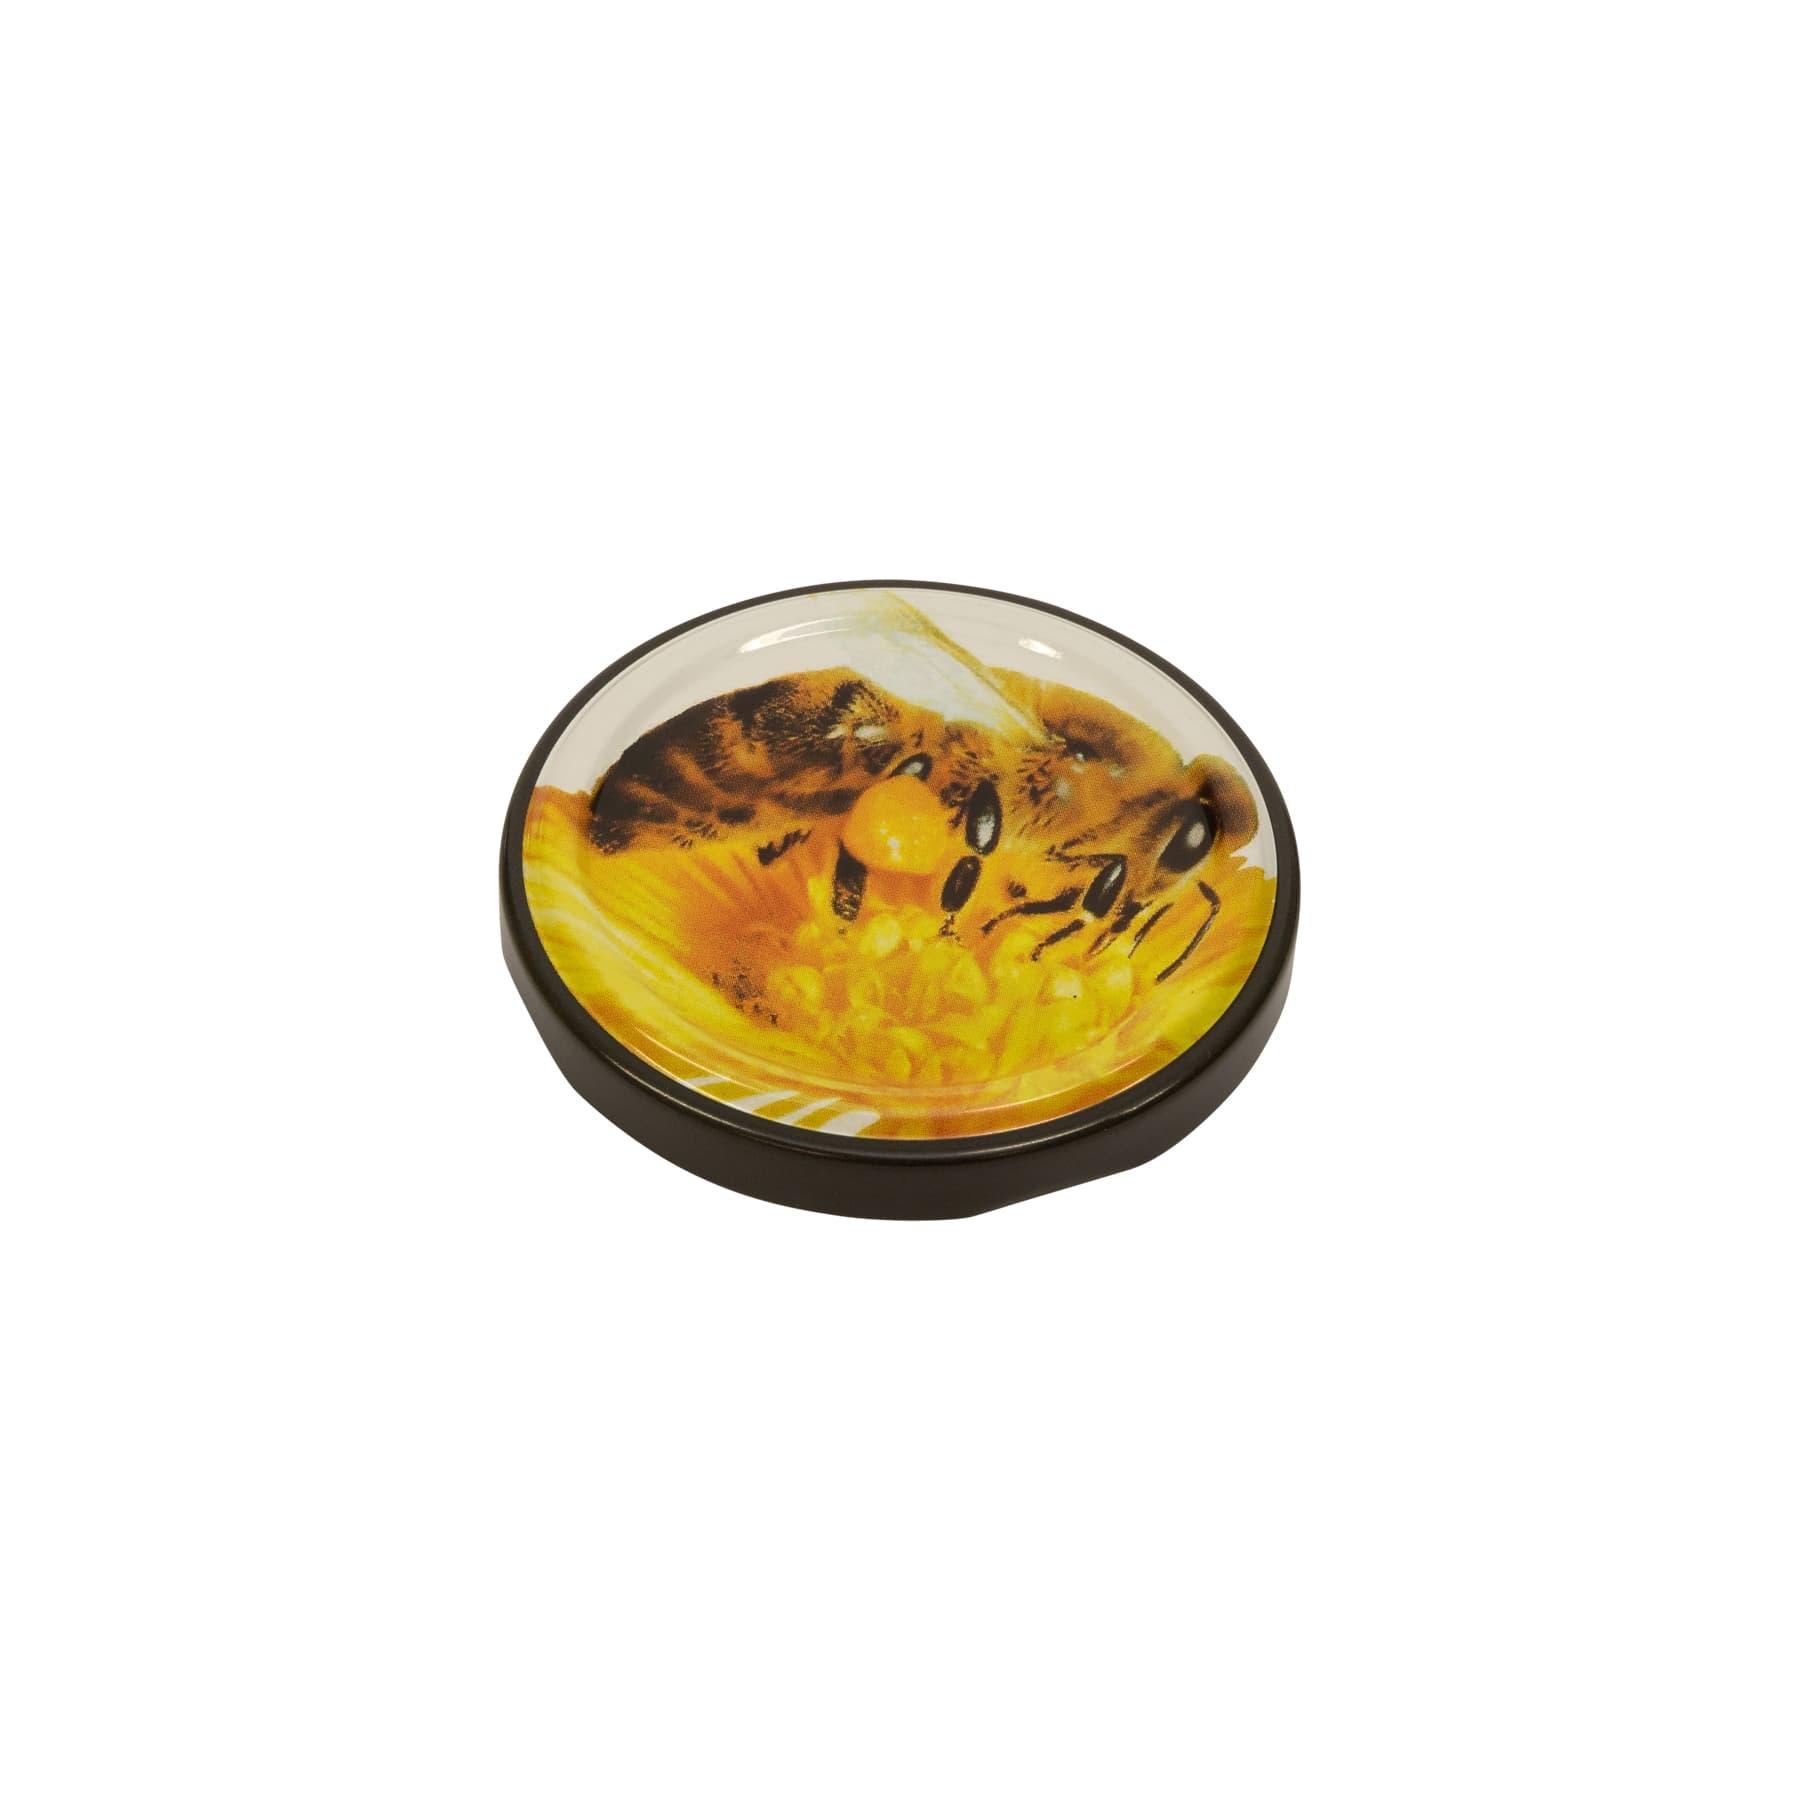 Twist Off Deckel Metall große Biene auf Blüte 66 mm